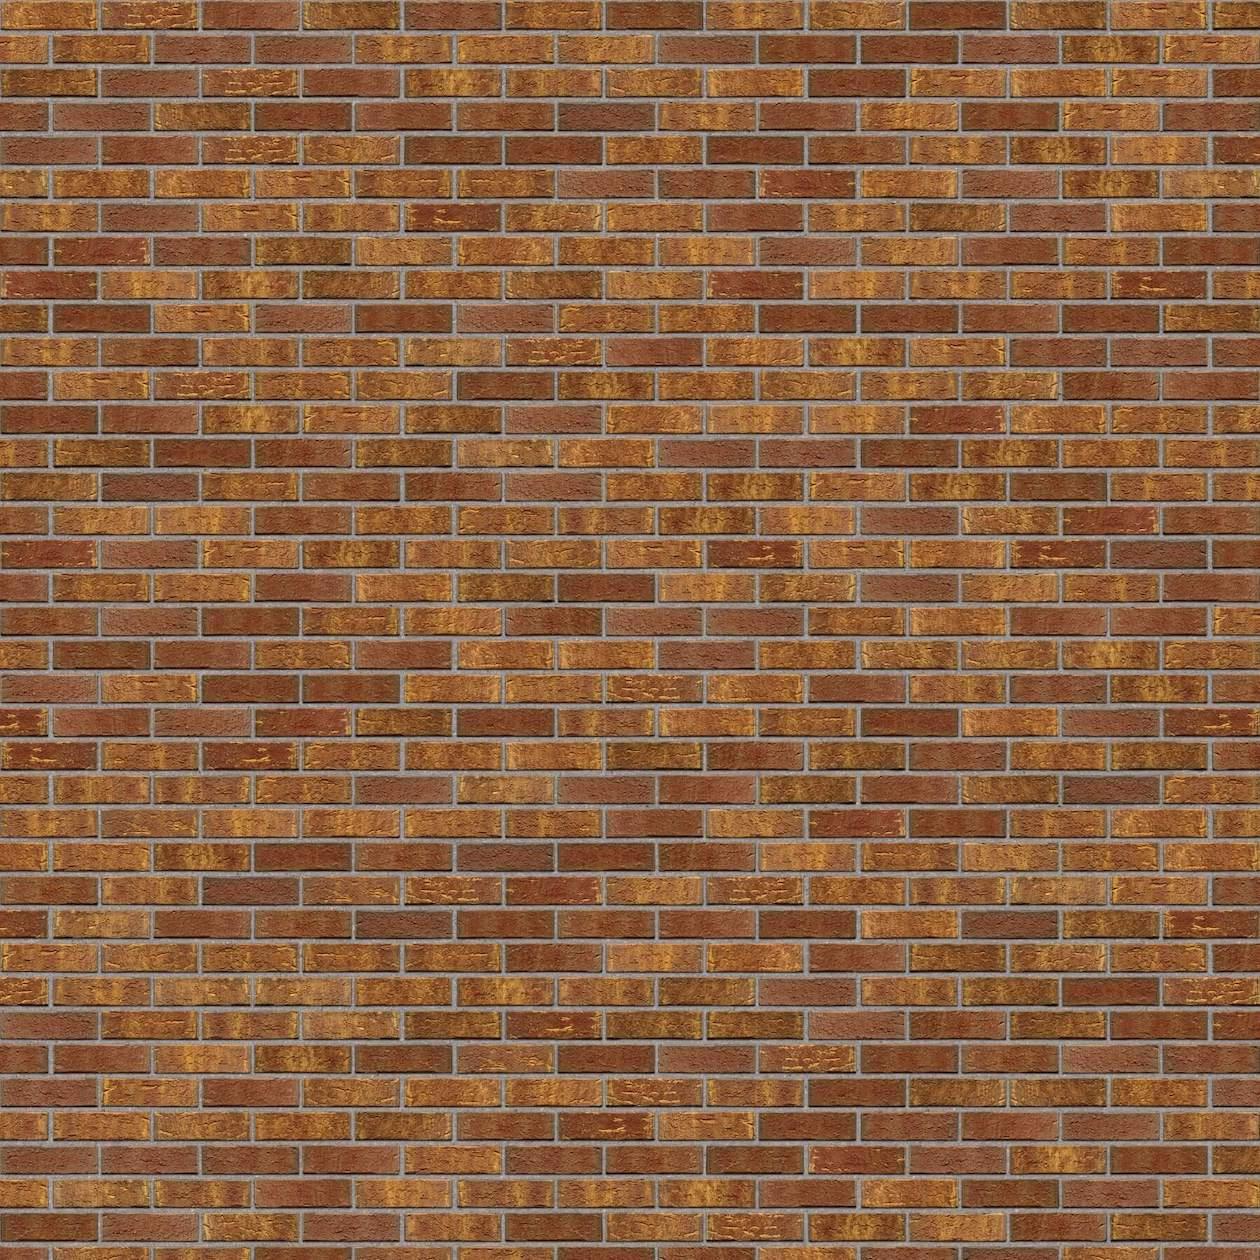 Puna-cigla-FeldHaus-Klinker-brick-house-nf-k-686-Siva Fuga